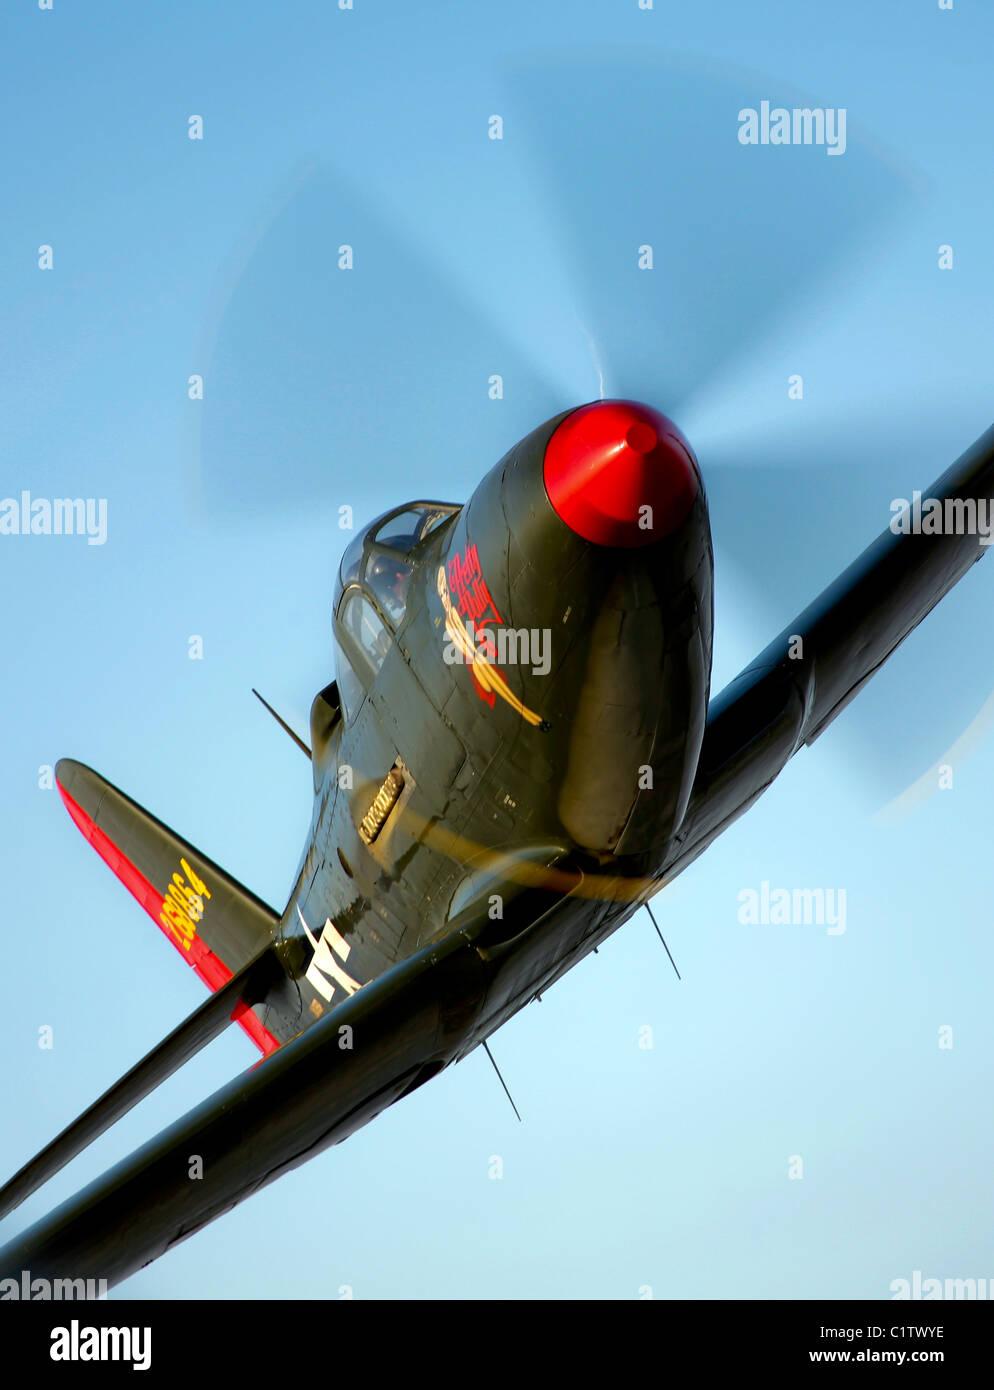 A Bell P-63 Kingcobra in flight near Chino, California. - Stock Image